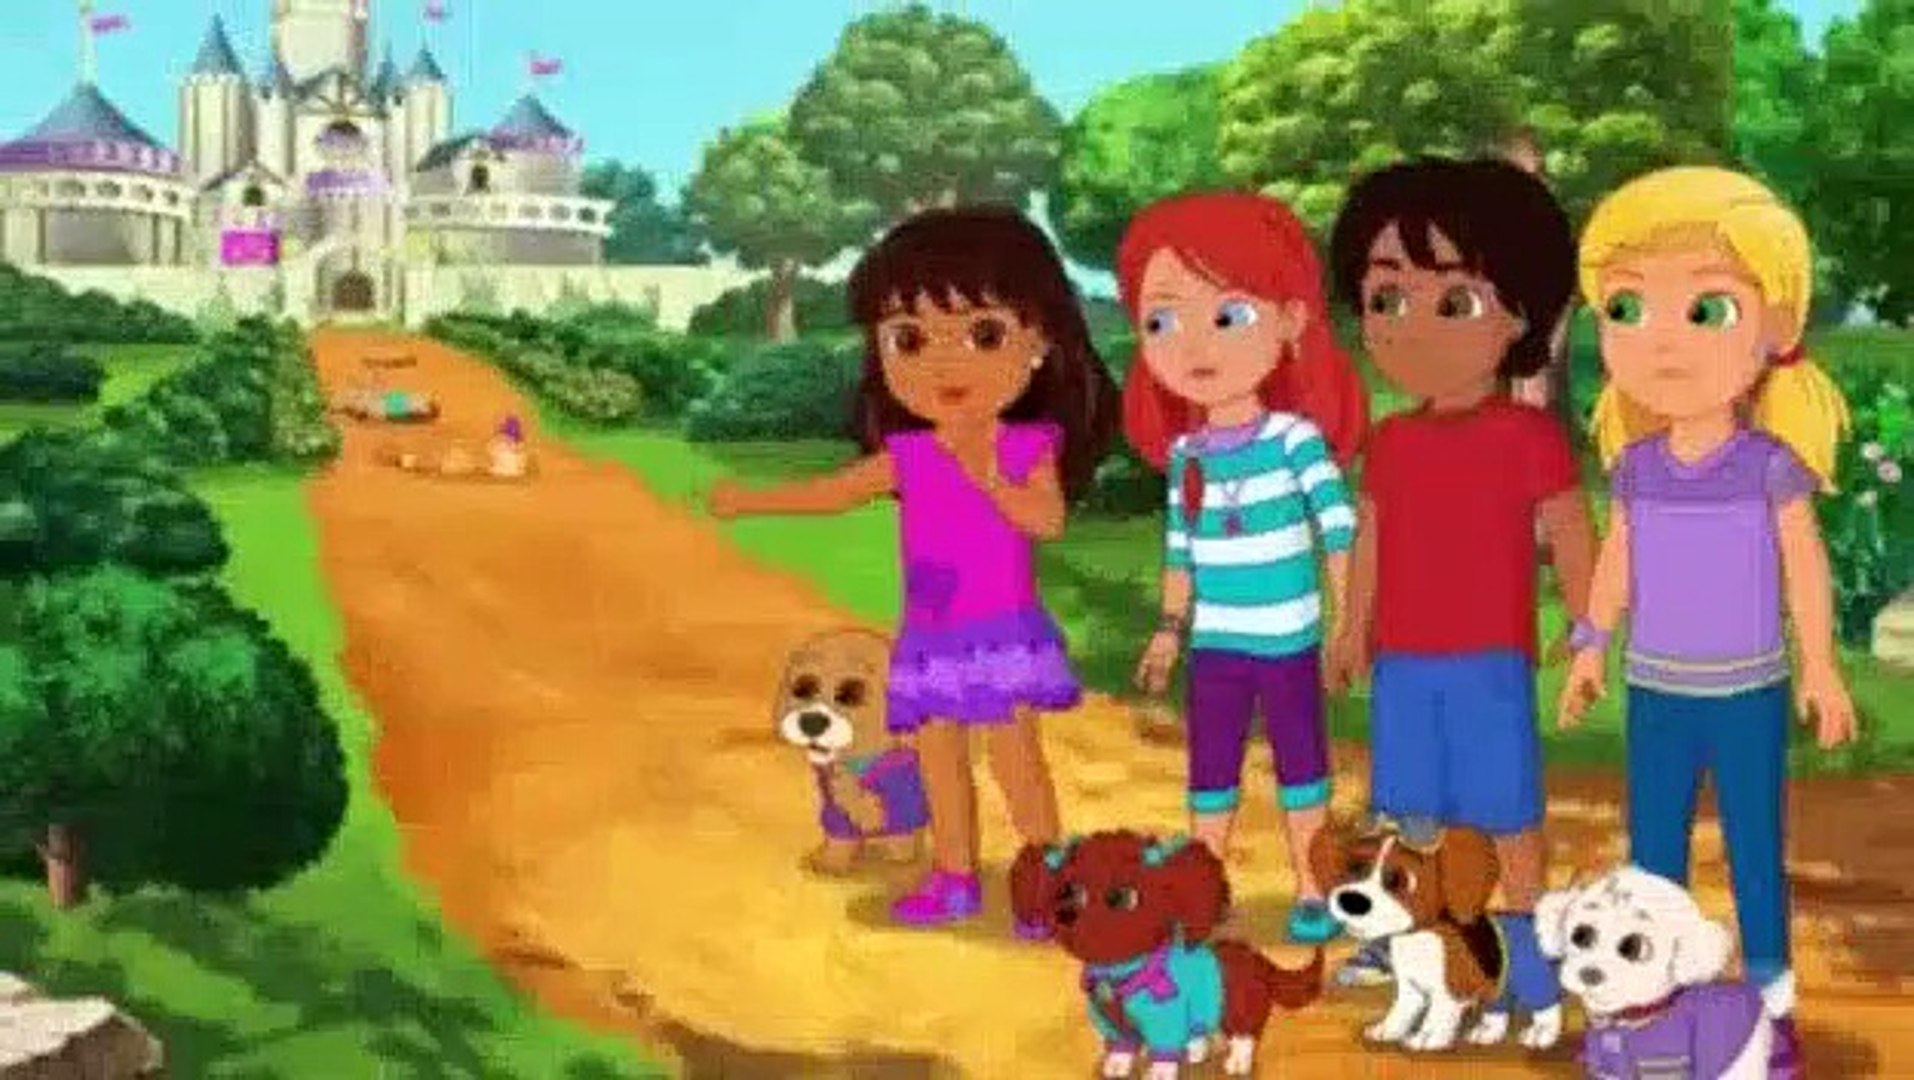 Dora and Friends Into the City! S01E14 - Puppy Princess Rescue (2)